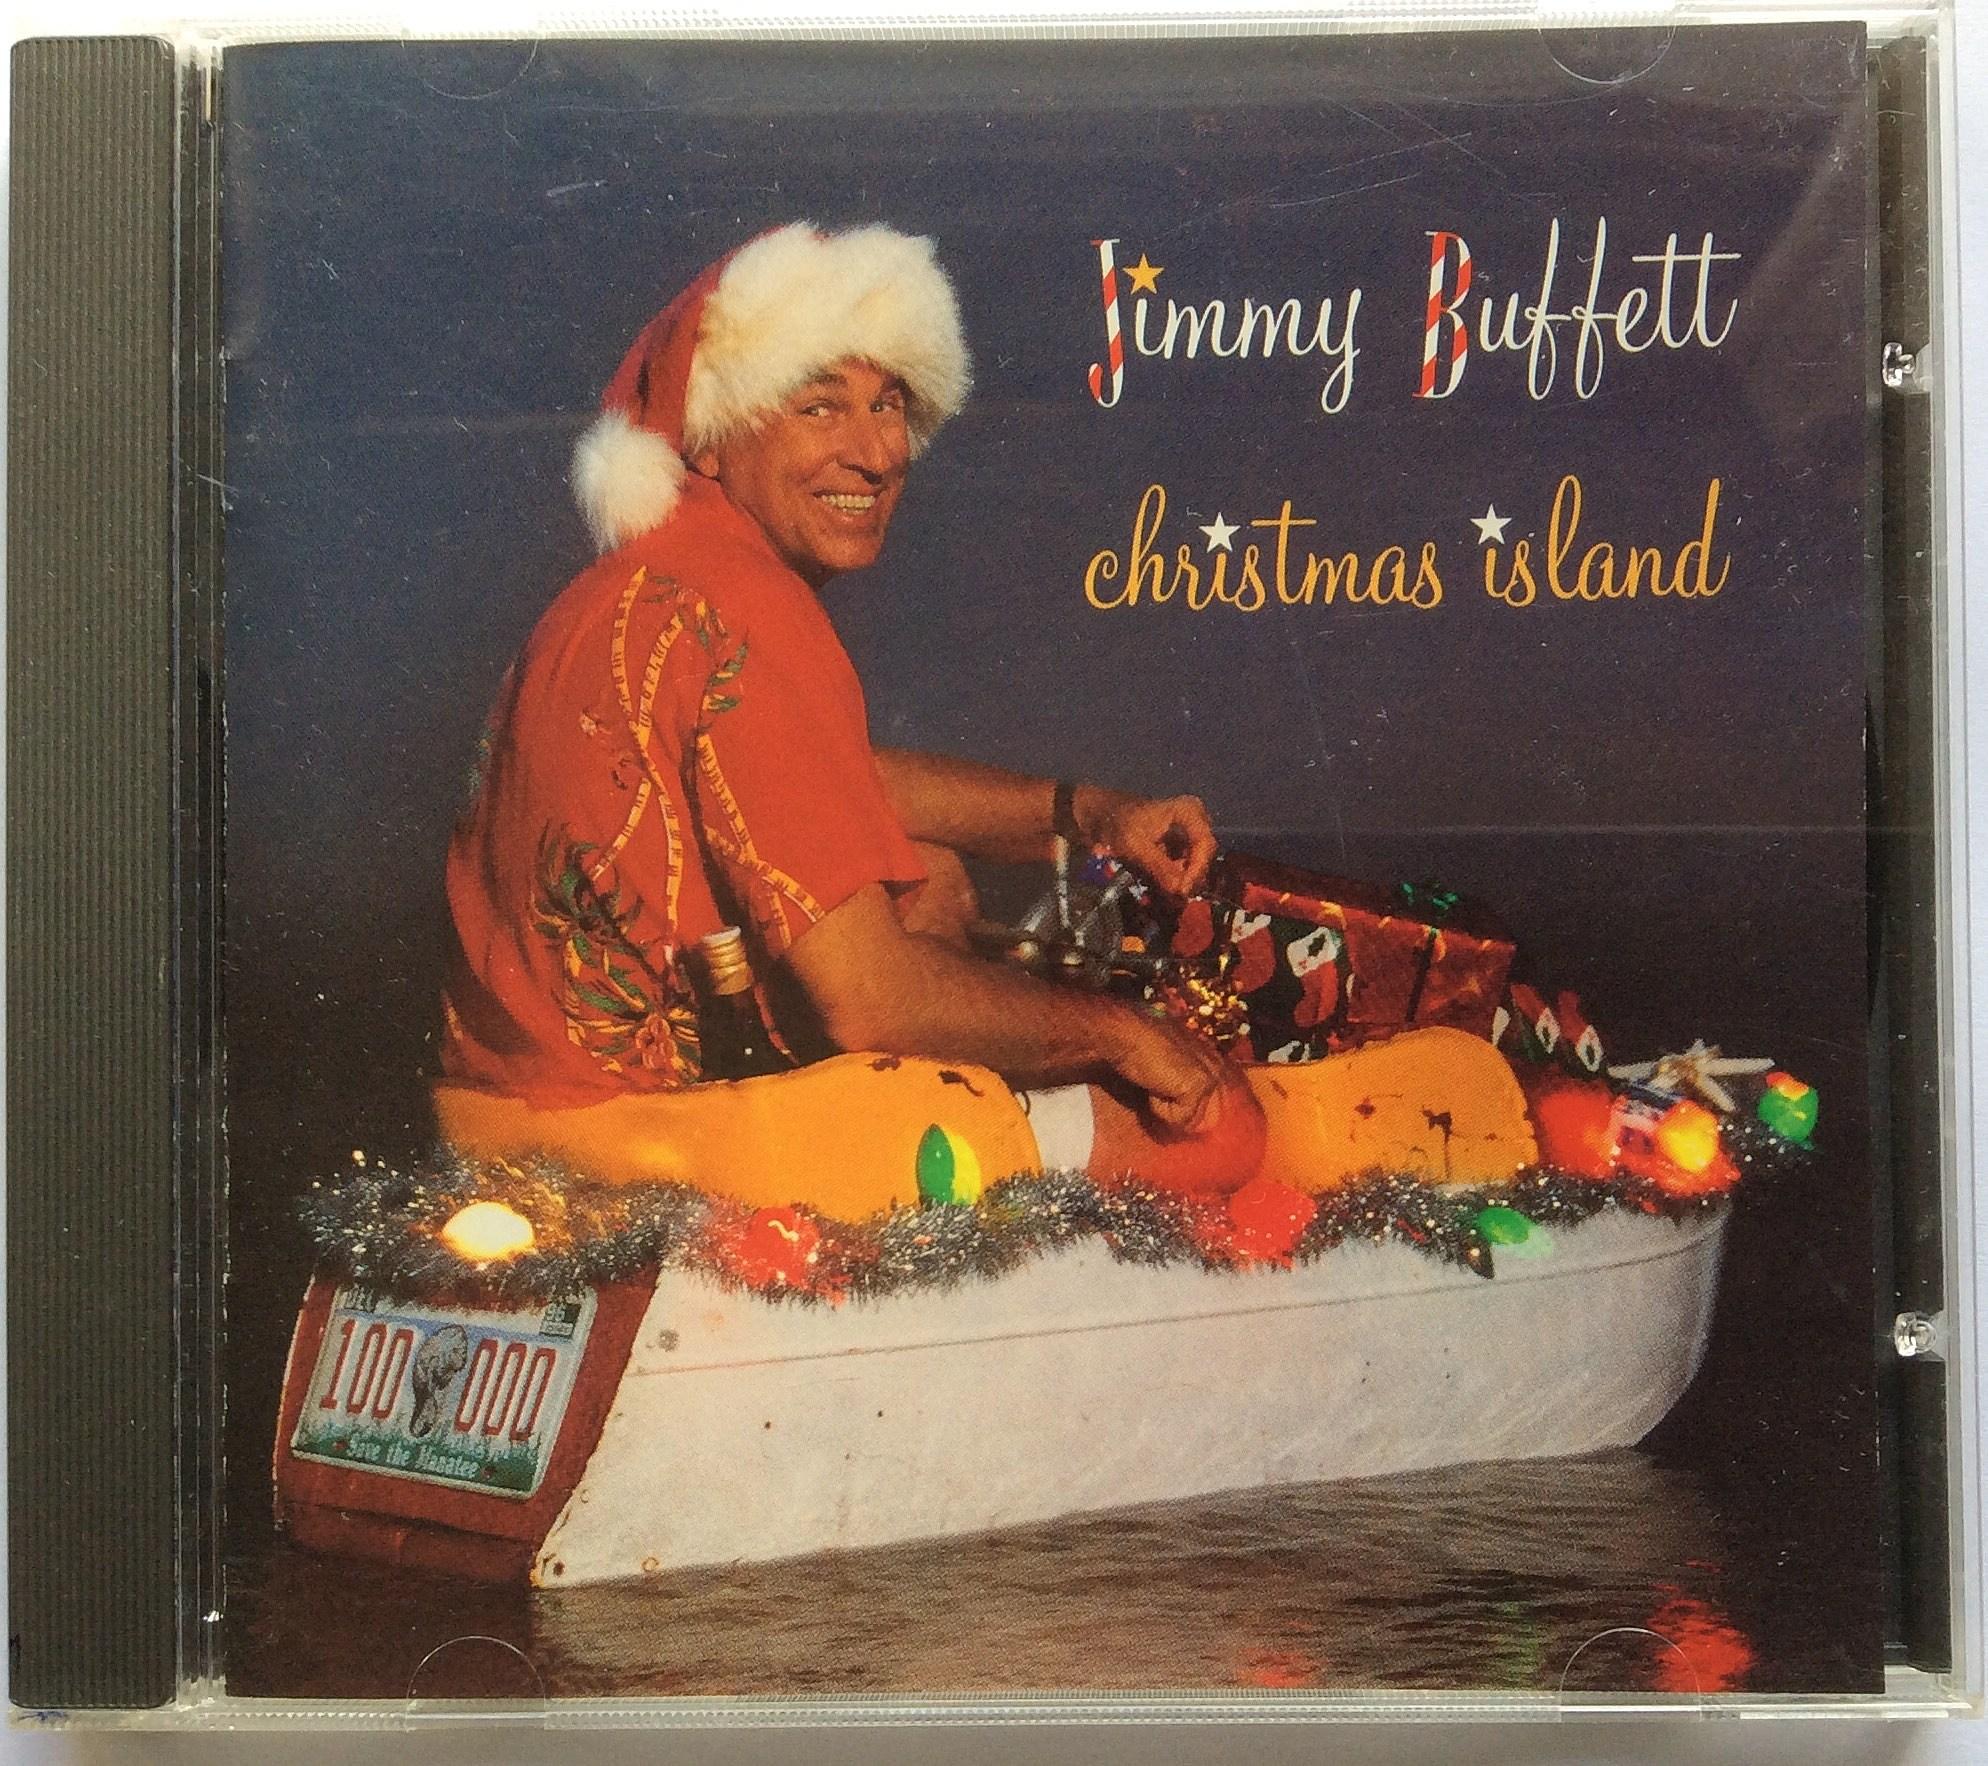 Merry Christmas Birthday to Jimmy Buffett